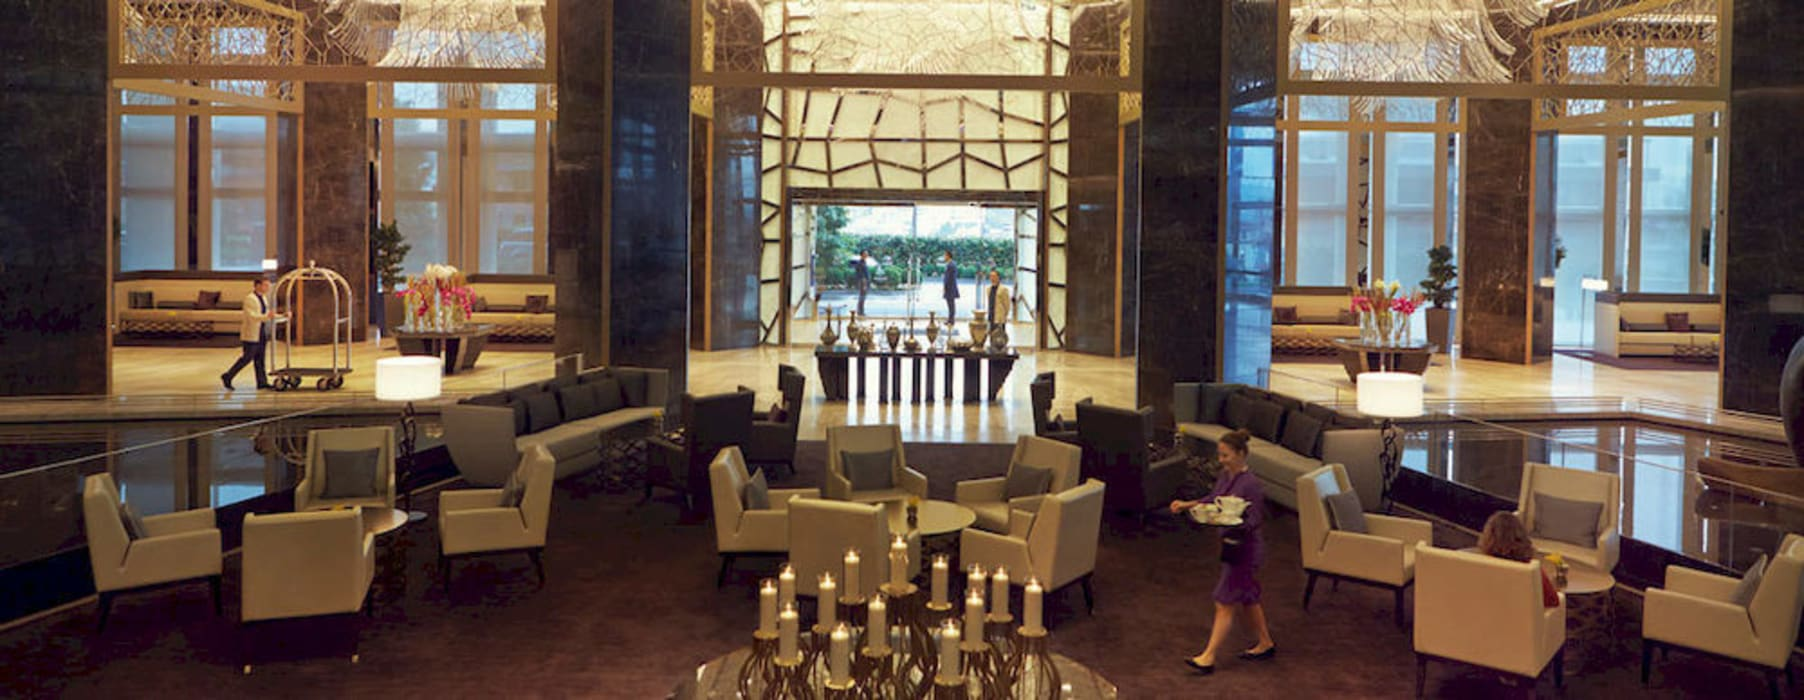 Raffless Hotel Zorlu Center- Backlit Onyx Modern Oteller Lamına Stone Modern